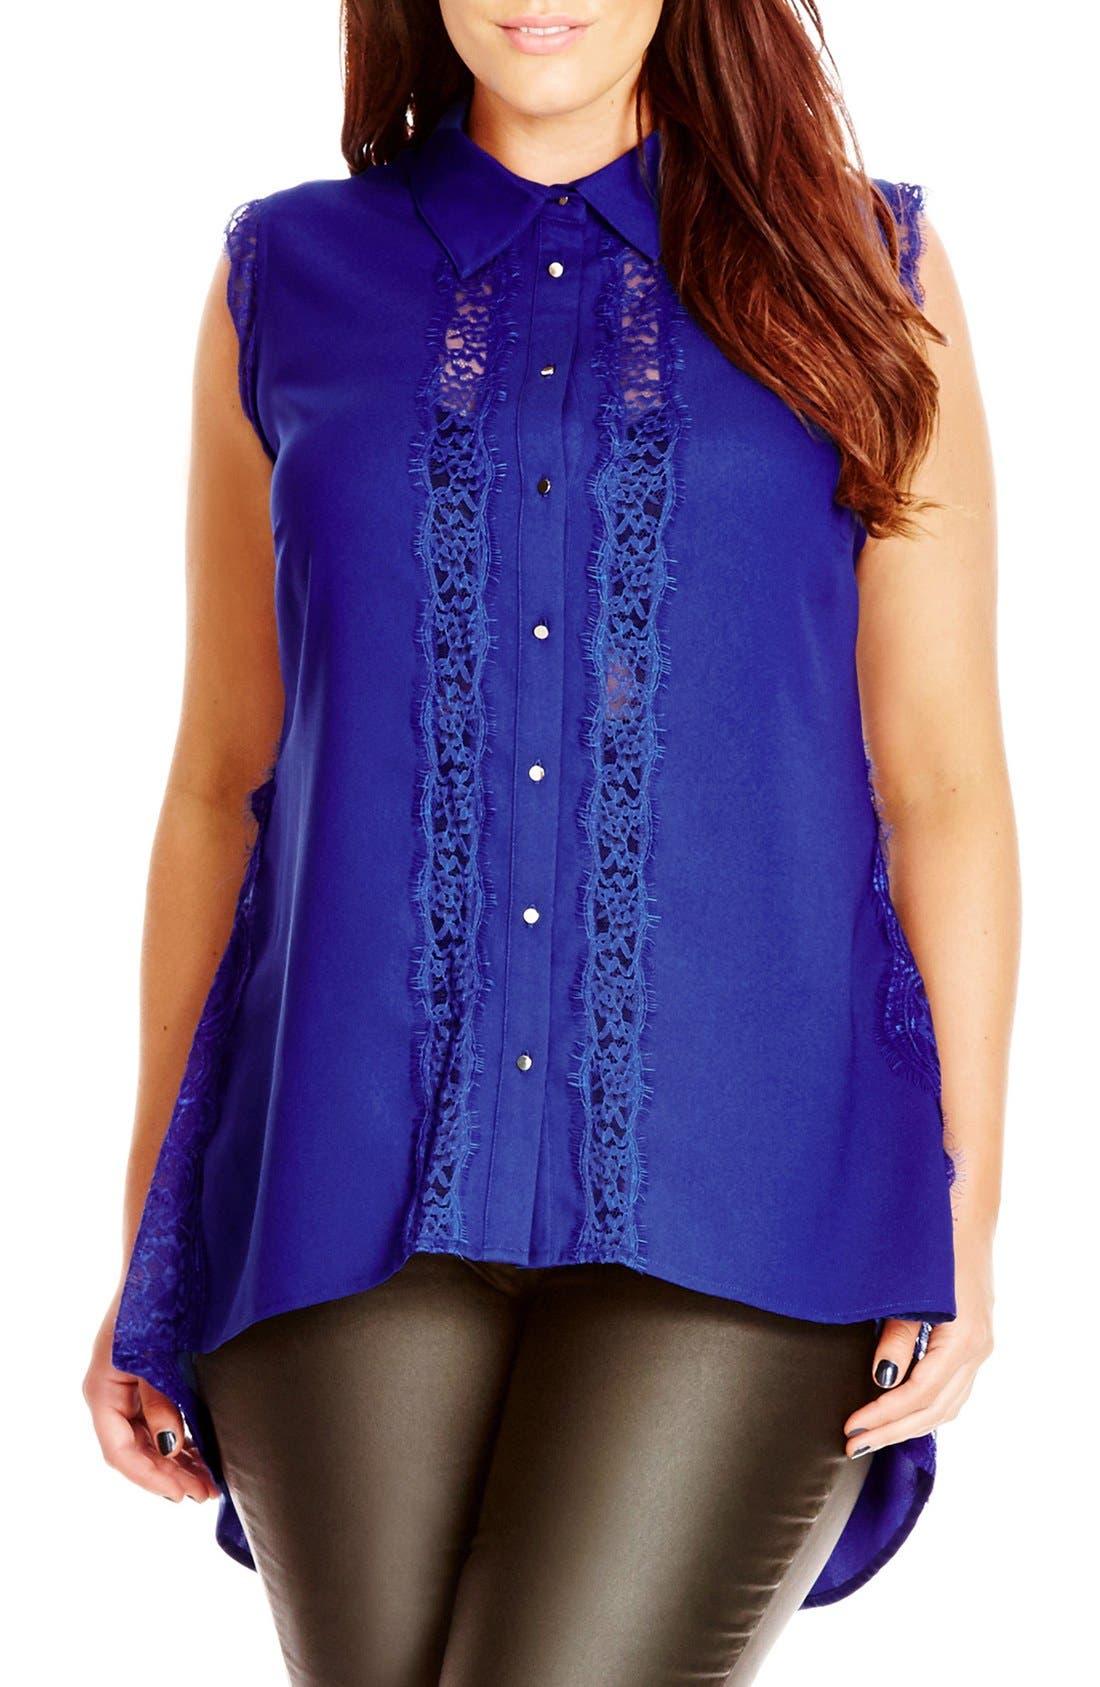 City Chic 'Pretty Lace' Sleeveless High/Low Shirt (Plus Size)